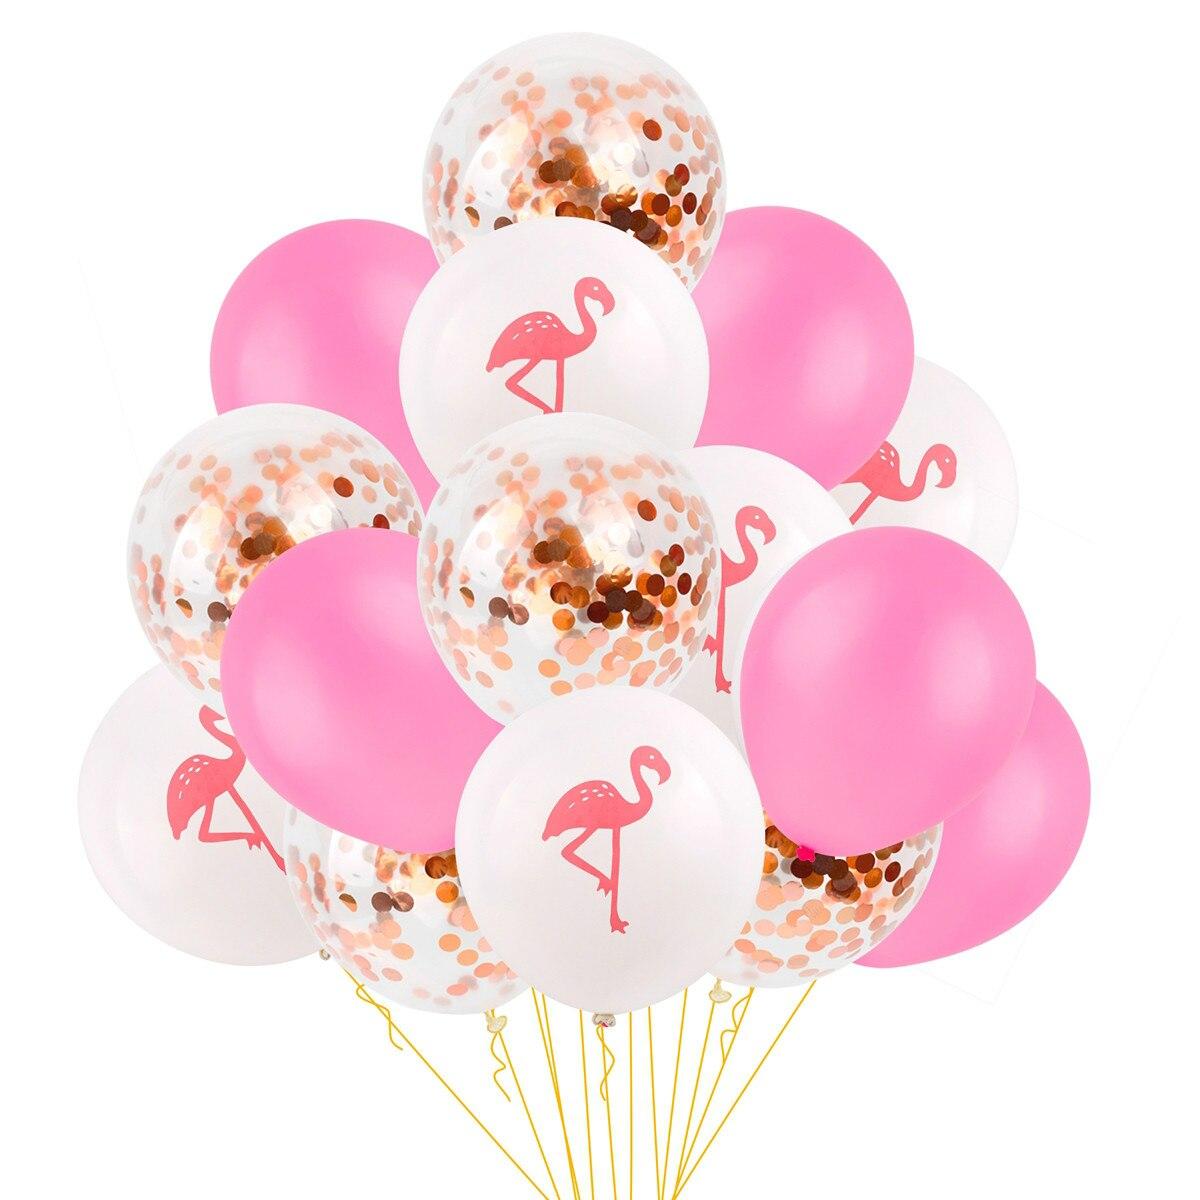 FRIGG 12inch Mixed Flamingo Balloon Round Animal Pattern Balloons Summer Latex Ballon Hawaiian Party Decor